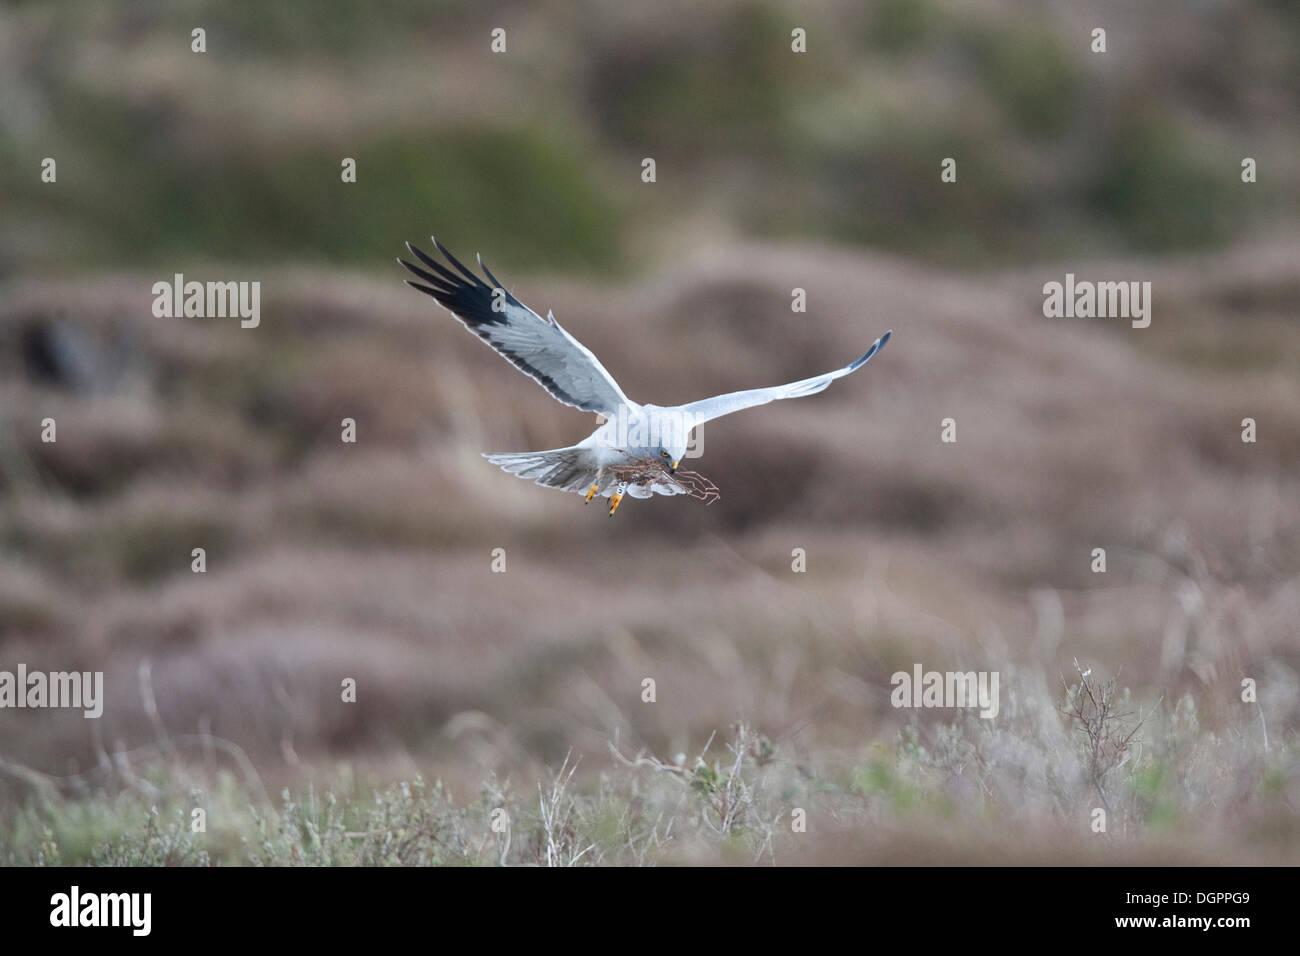 Hen harrier in flight (Circus cyaneus), male, Texel, Netherlands, Europe Stock Photo